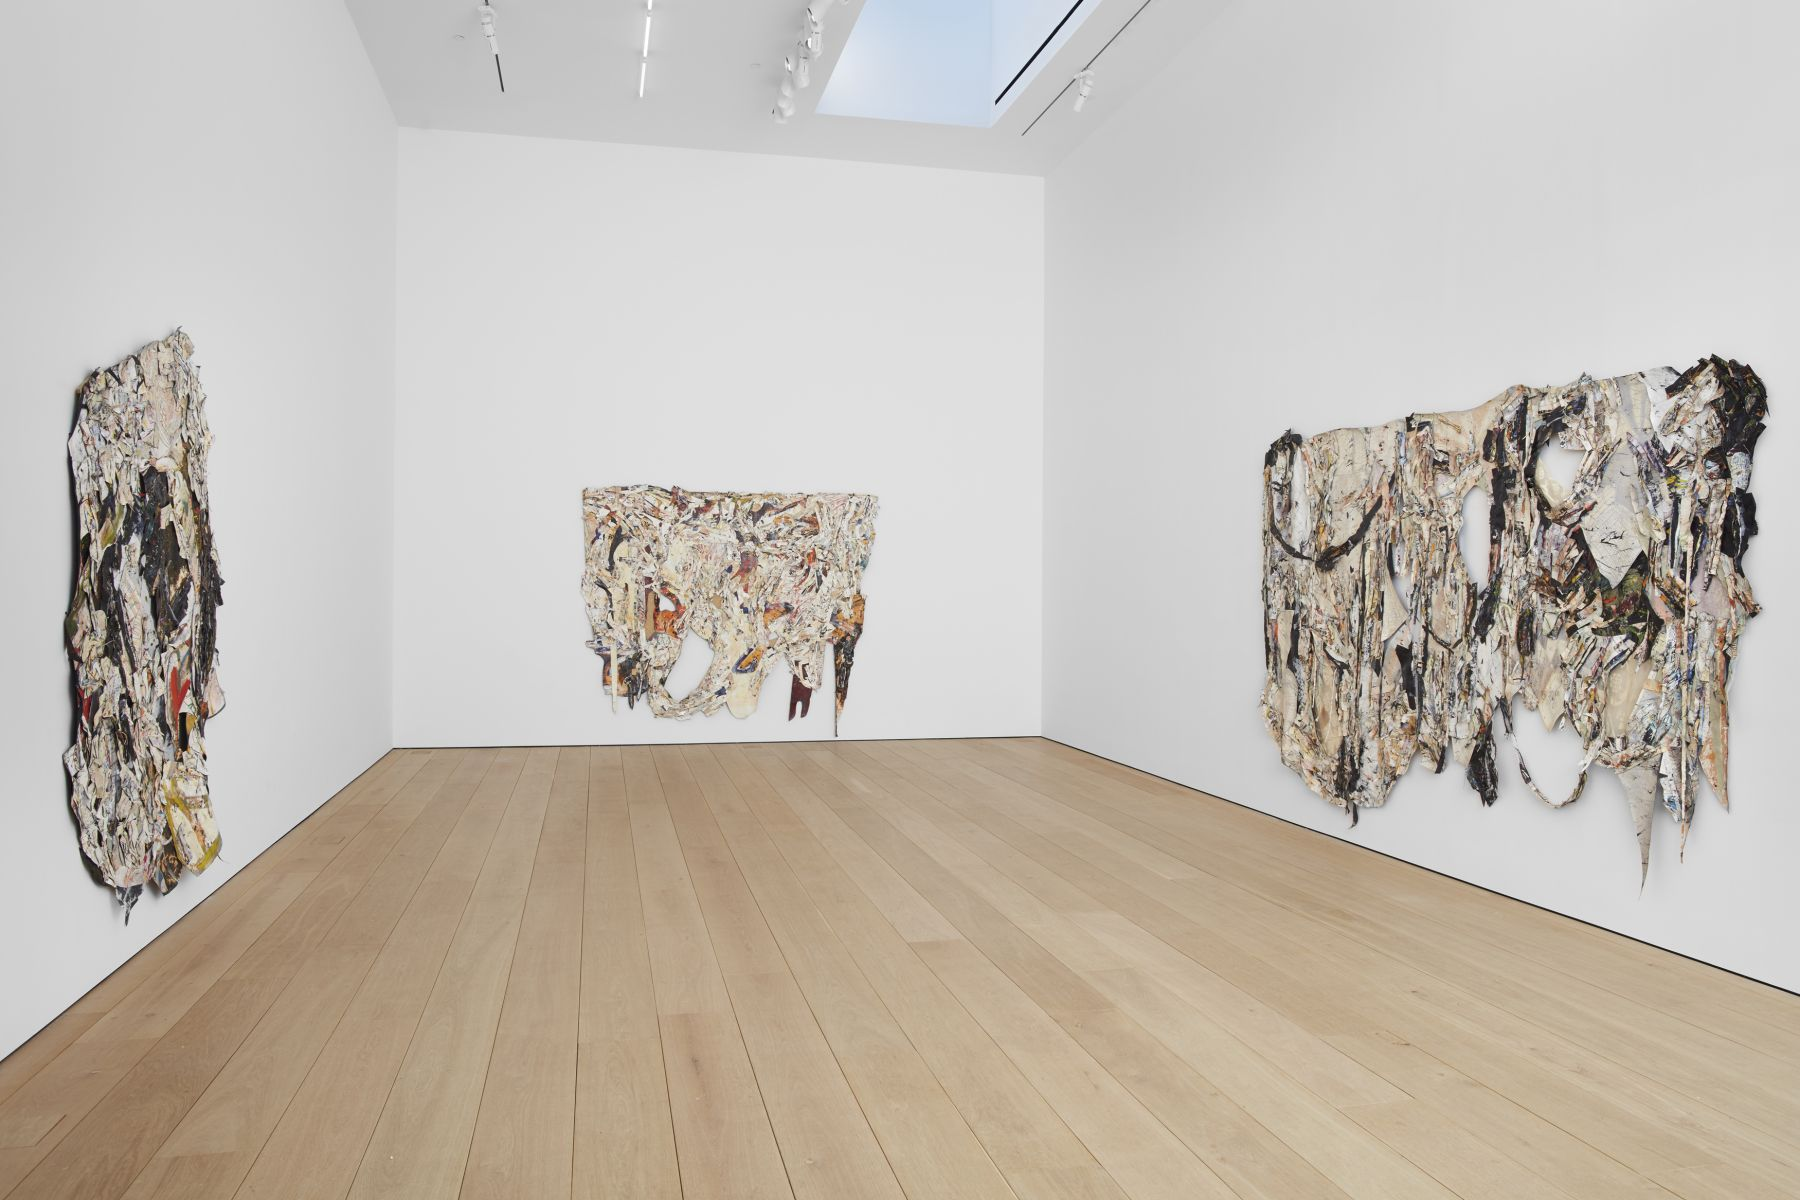 Angel Otero,Milagros, Installation view, Lehmann Maupin, 501West 24th Street, New York, 2019